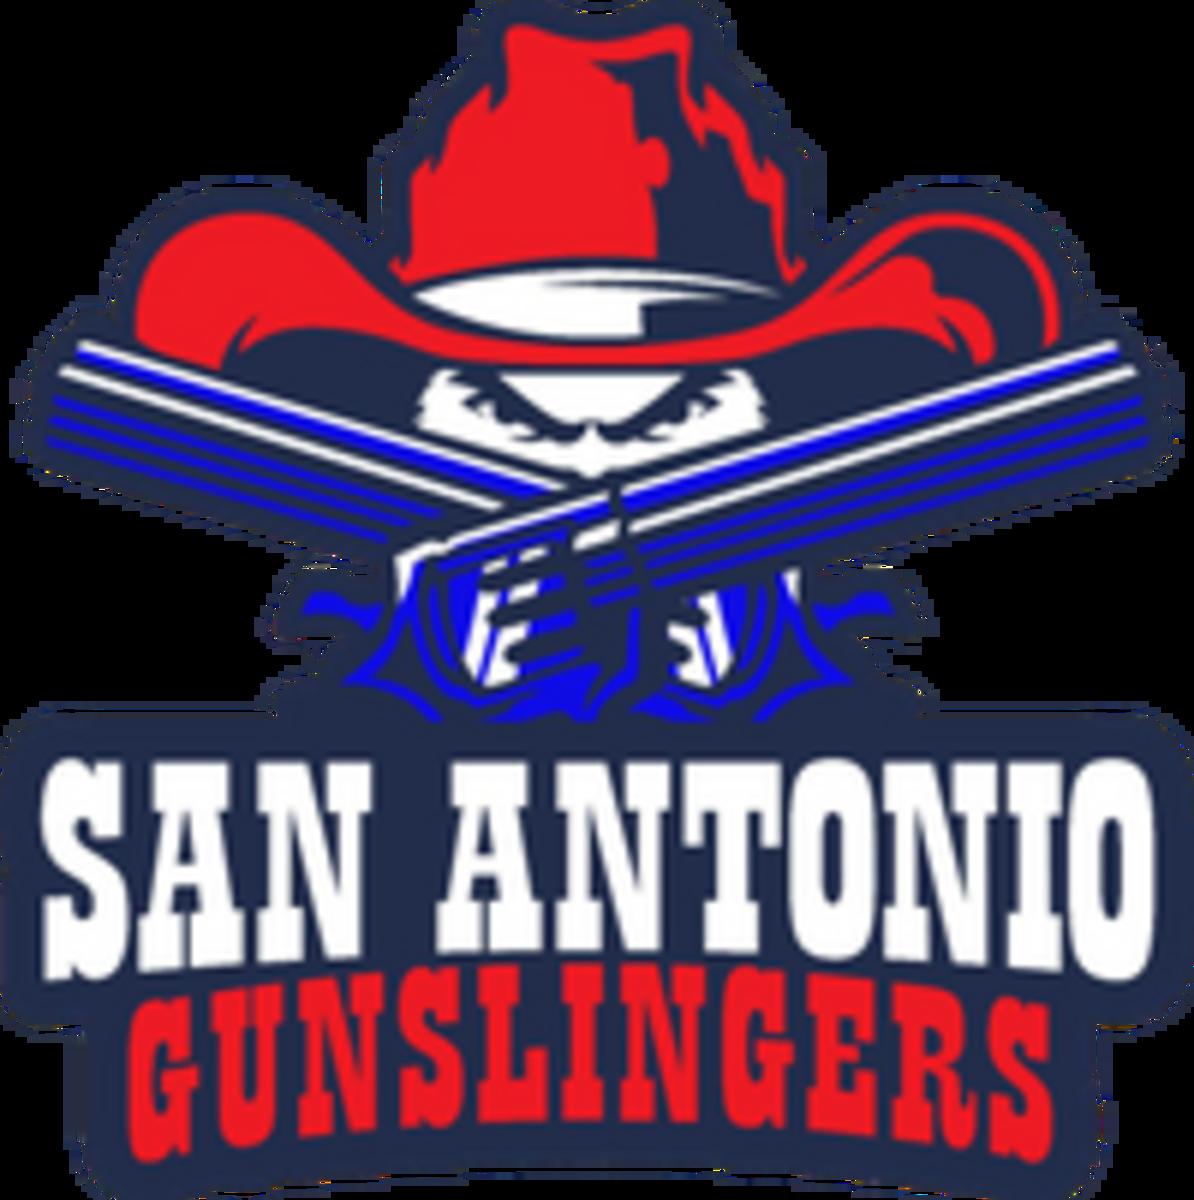 Gunslingers cfl